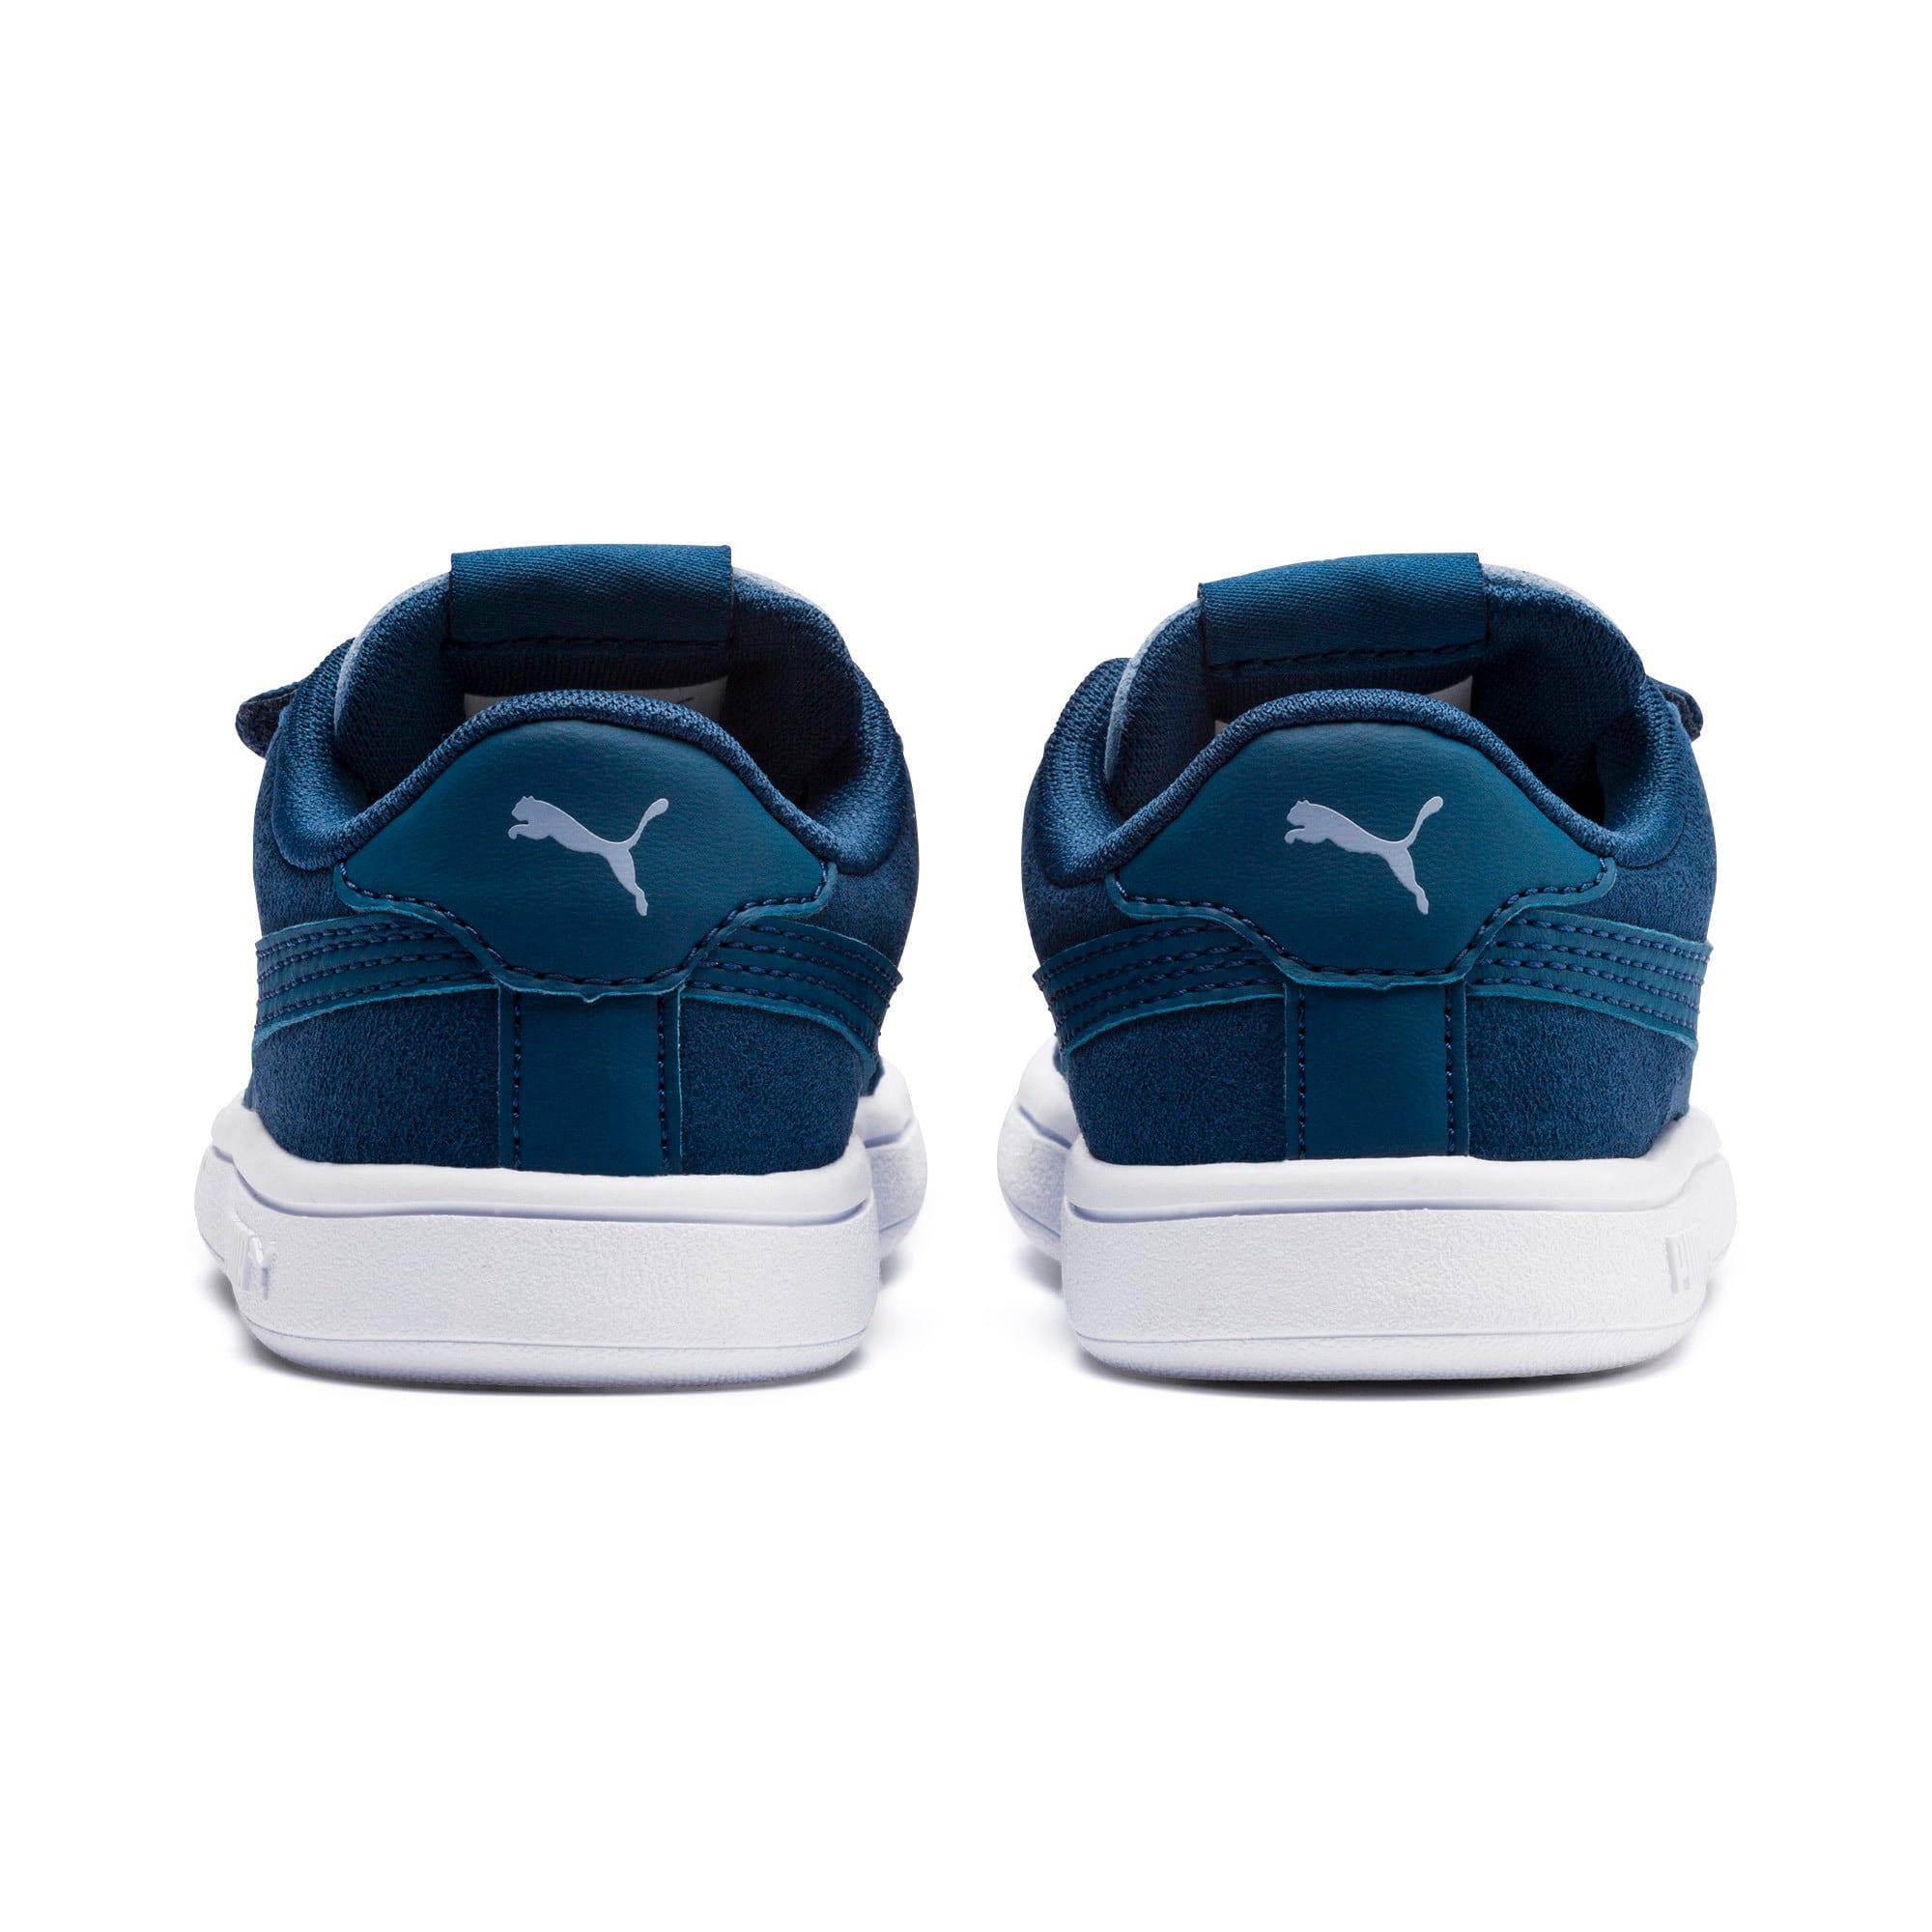 Thumbnail 3 of PUMA Smash v2 Monster Toddler Shoes, Gibraltar Sea-Faded Denim, medium